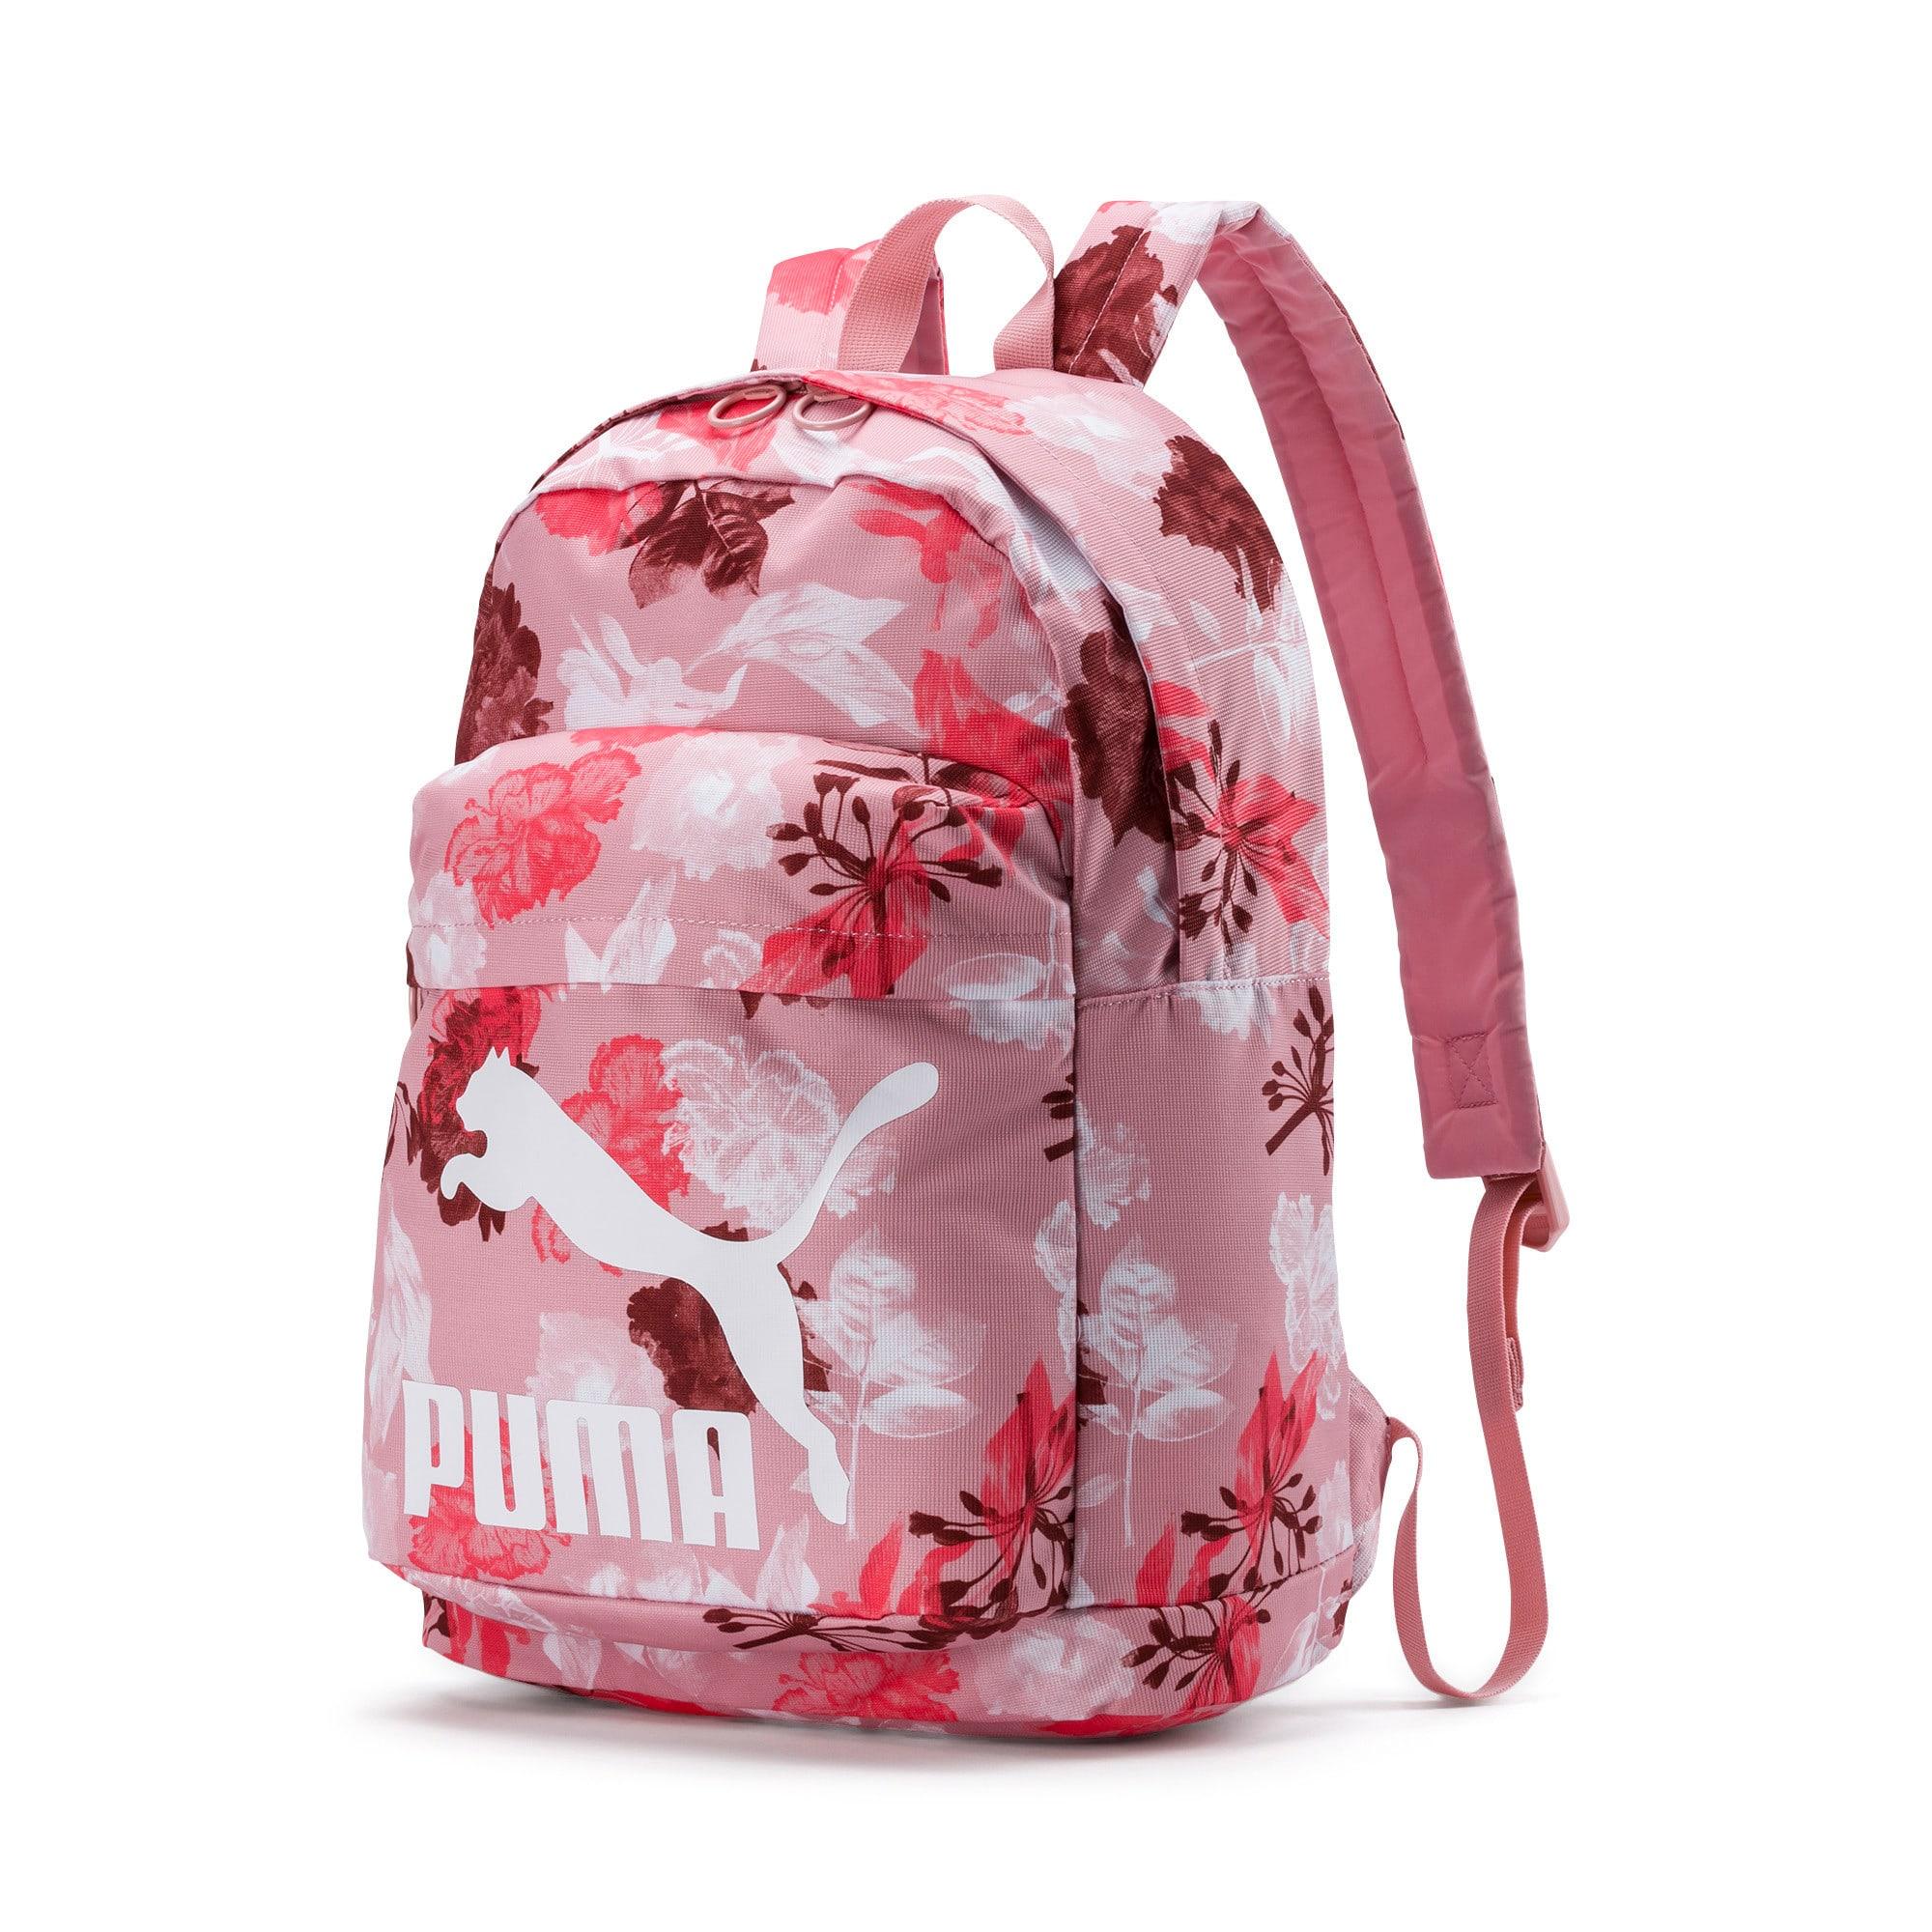 Thumbnail 1 of Originals Backpack, Bridal Rose-AOP, medium